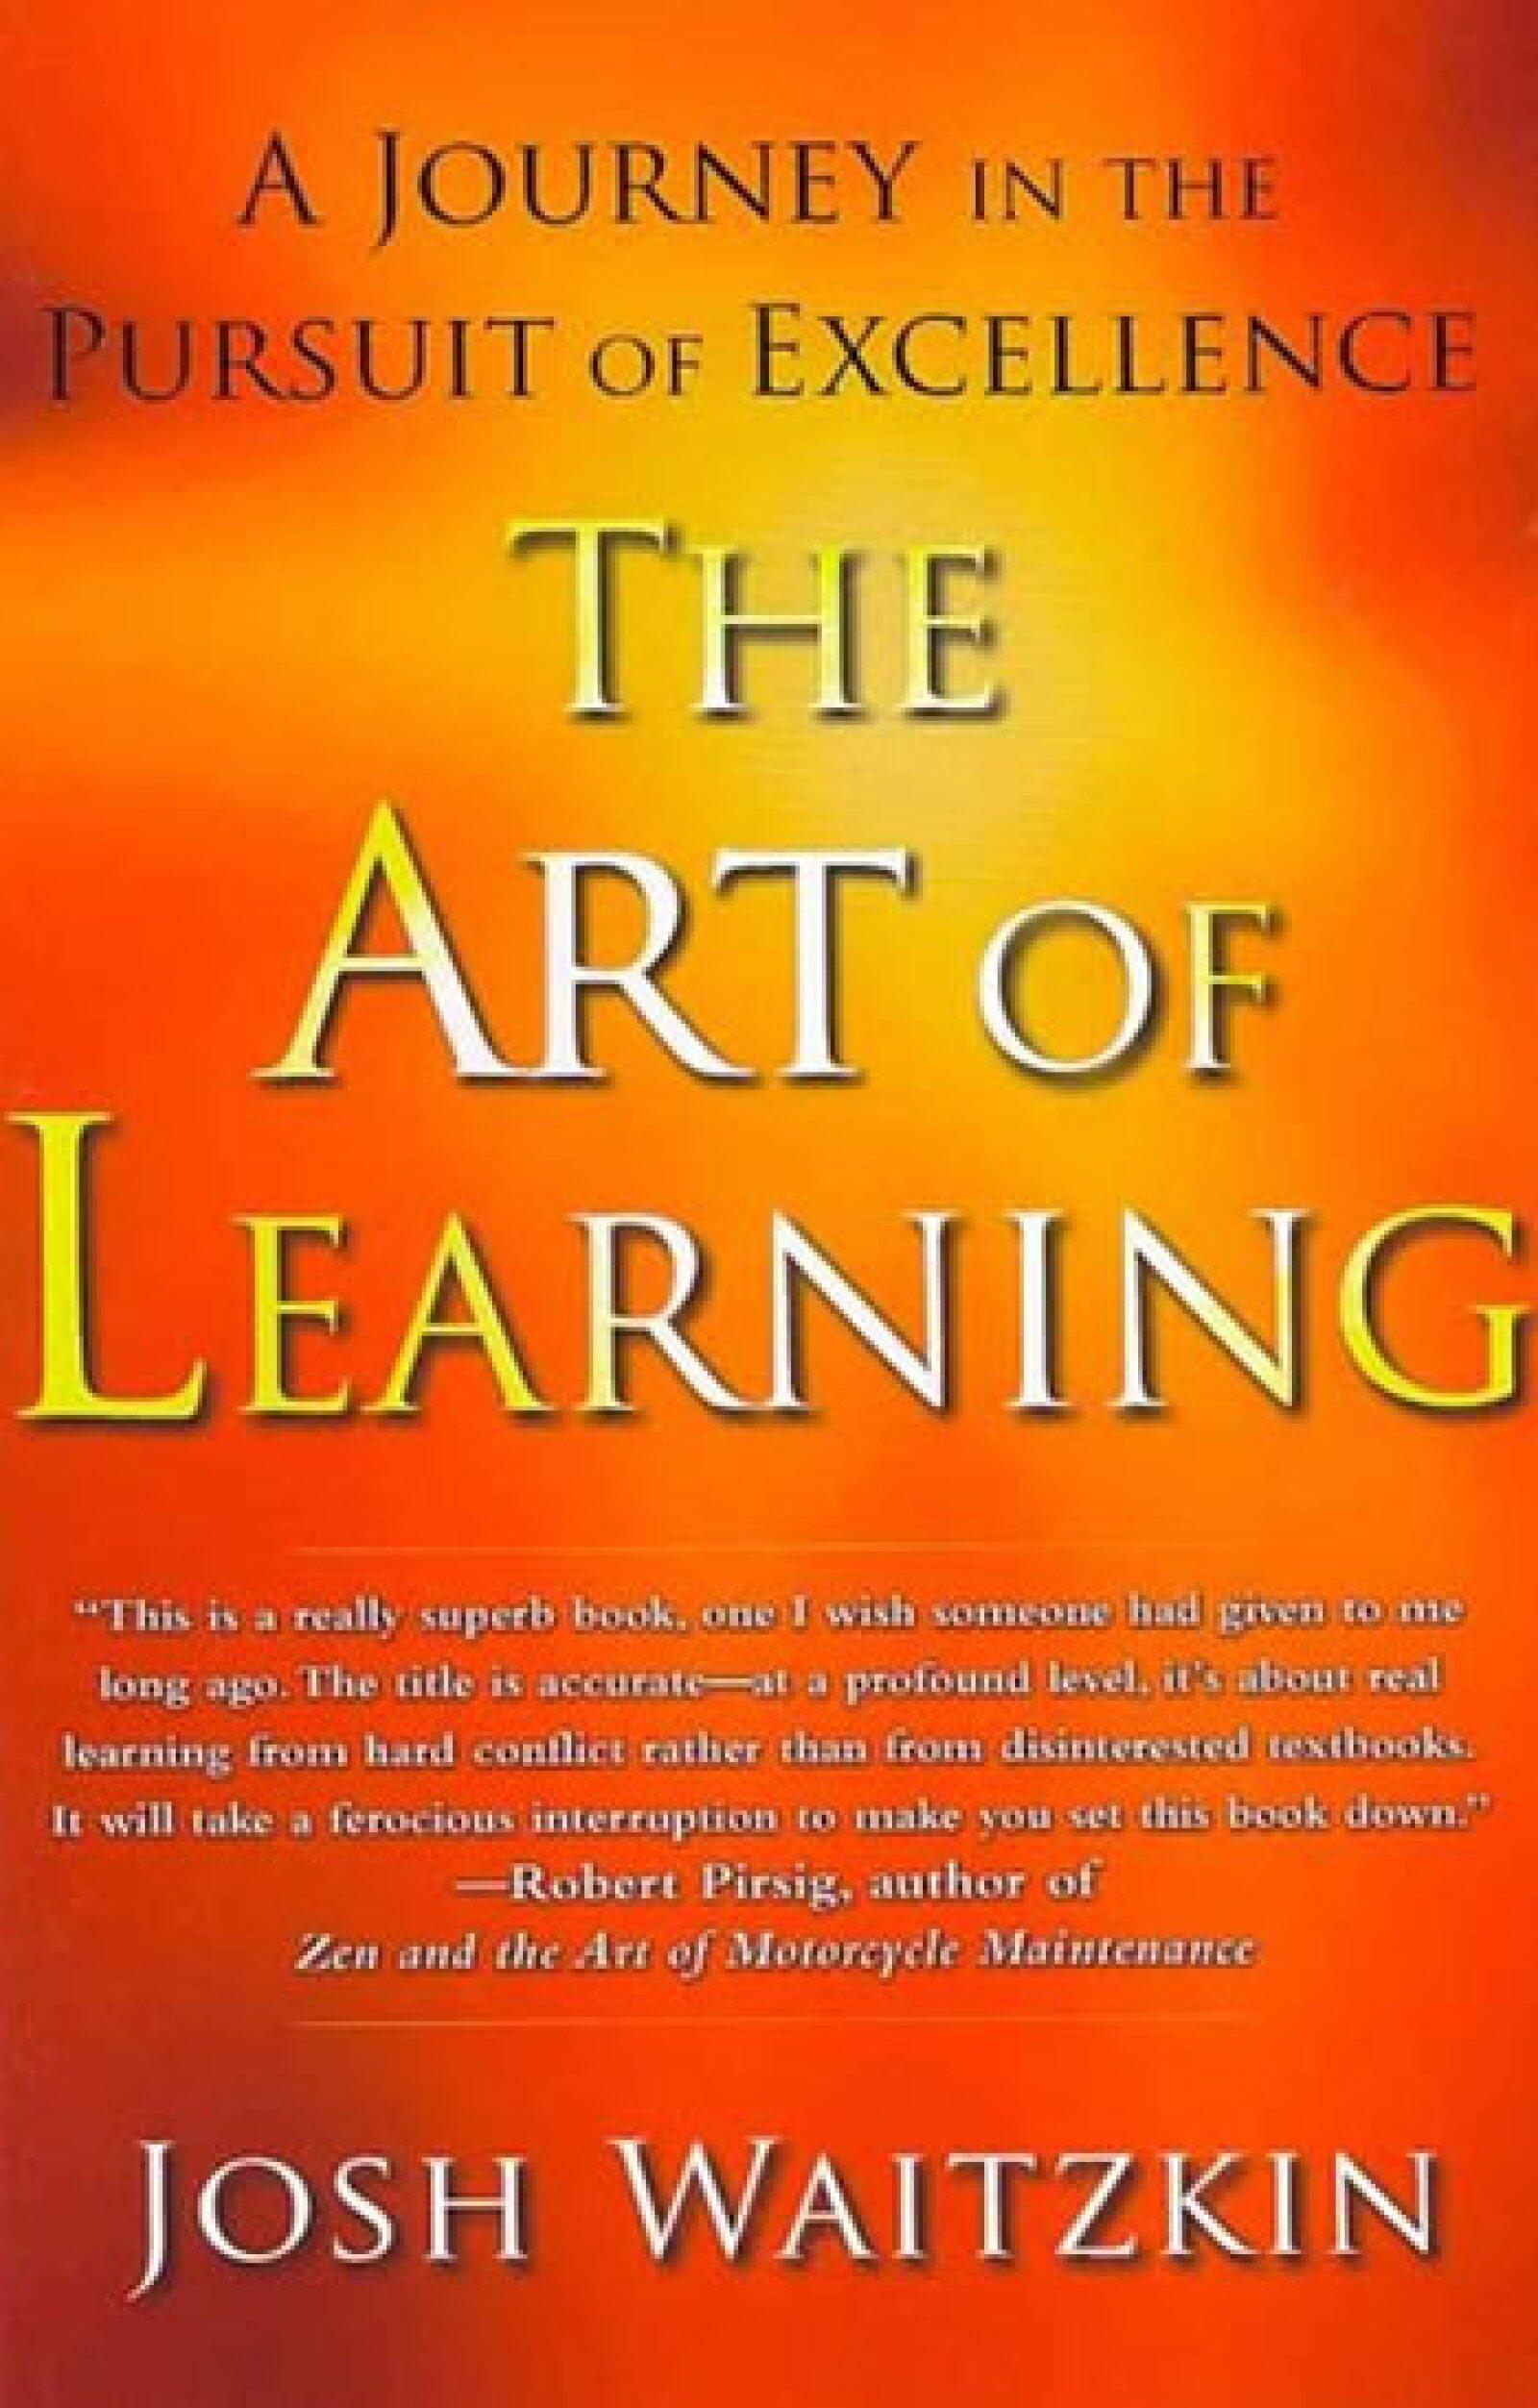 El arte de aprender de Josh Witzkin